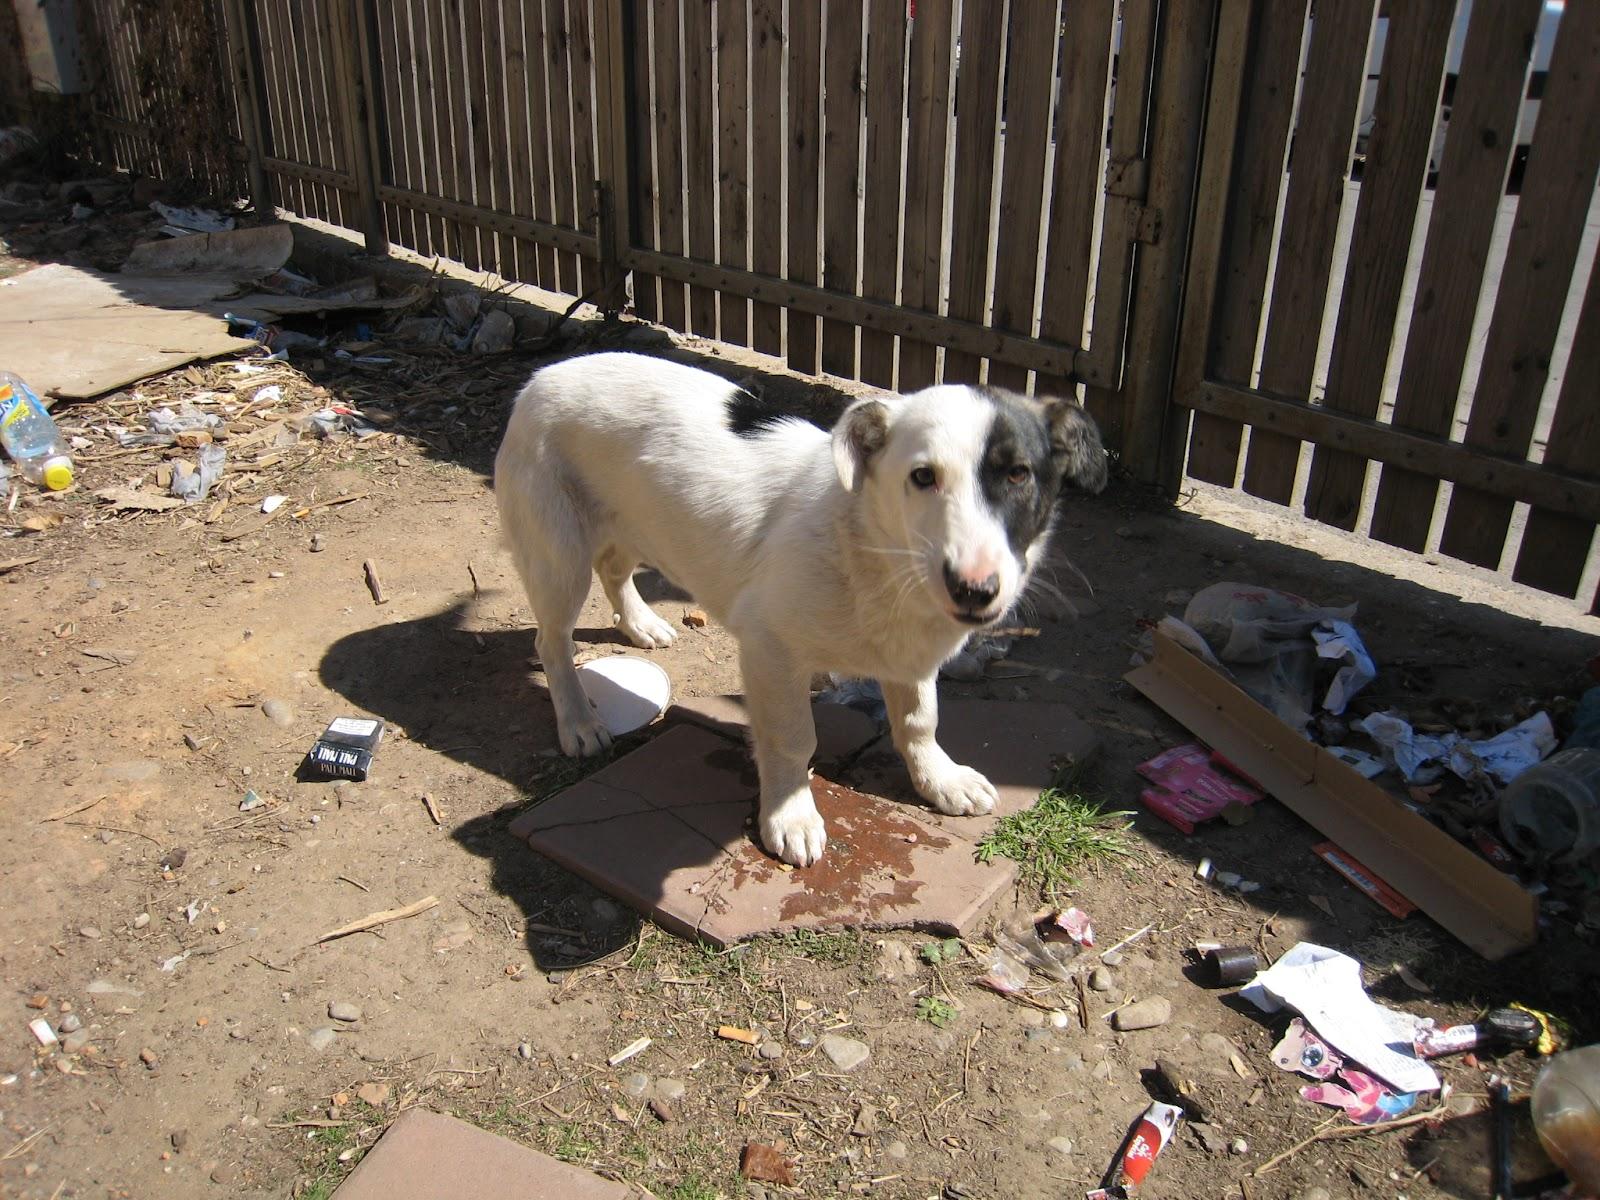 Romanian Stray Dogs Ploiesti - RSDP: One sad little doggie ...